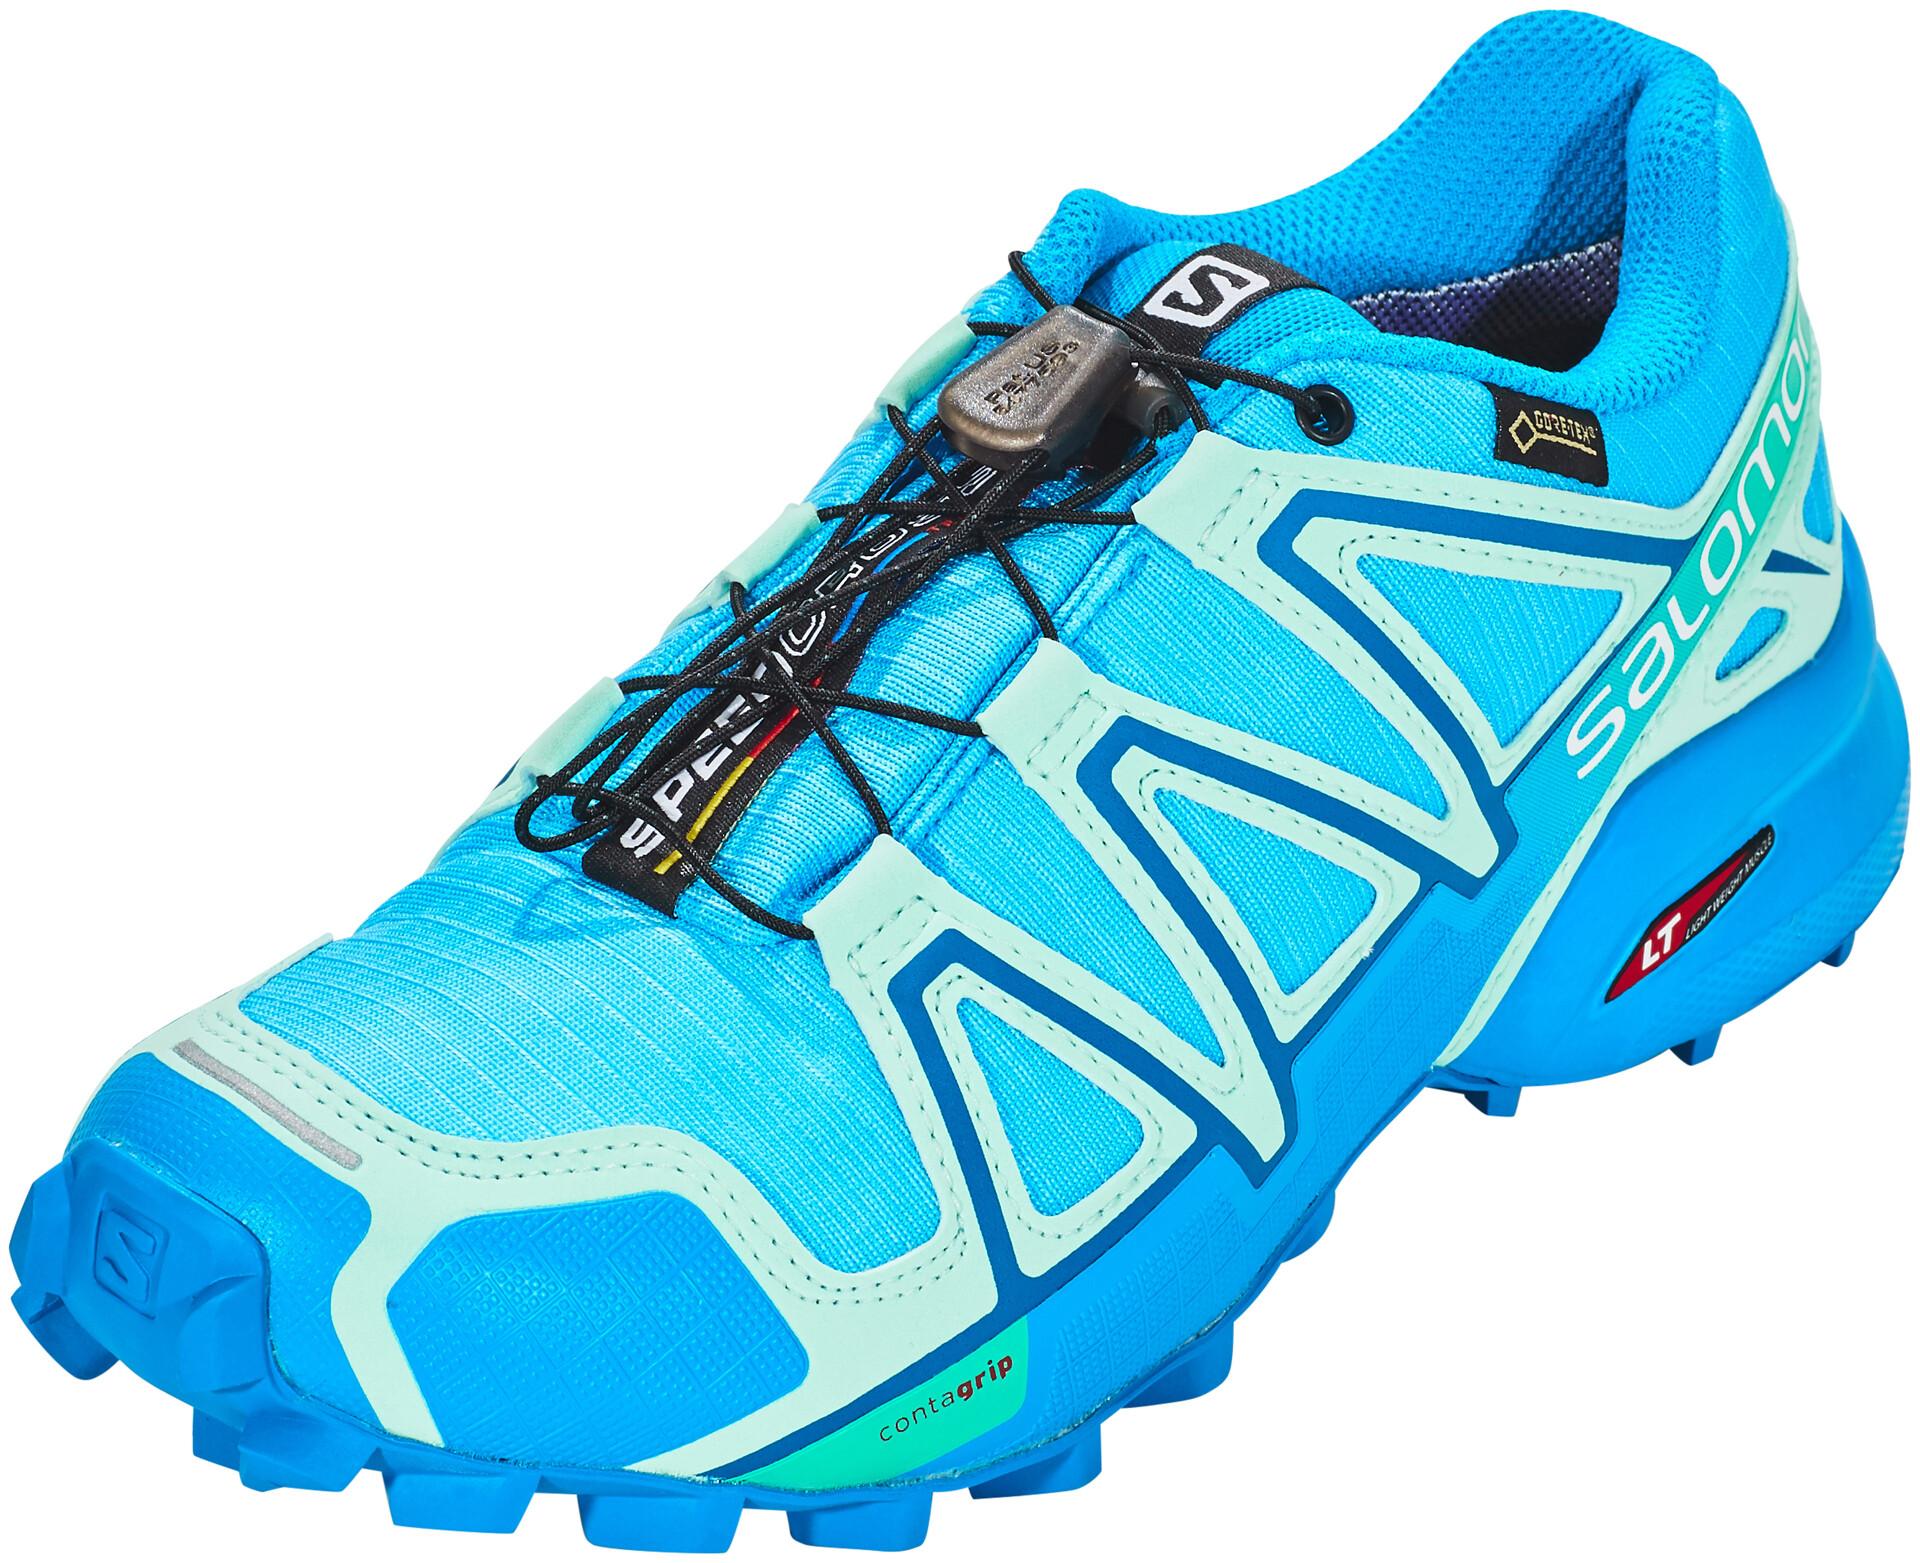 Turquoise Salomon Speedcross Femme Gtx Running 4 Chaussures xaxYA